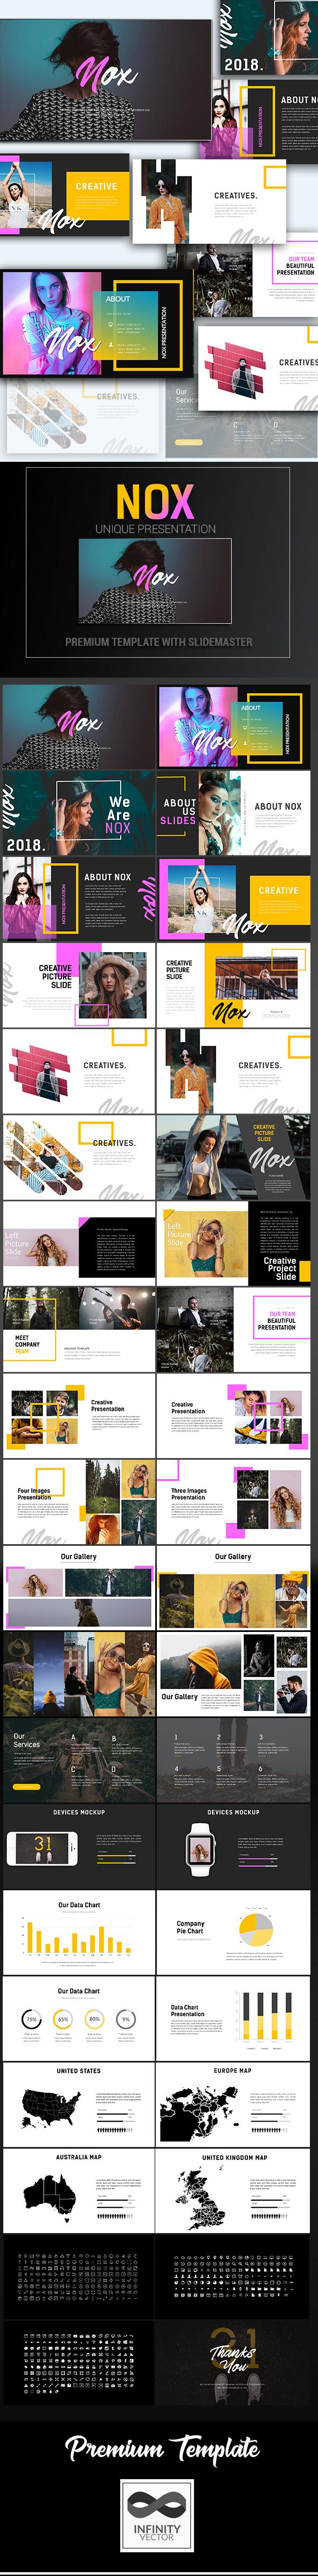 Nox Creative Presentation - PowerPoint Templates Presentation Templates